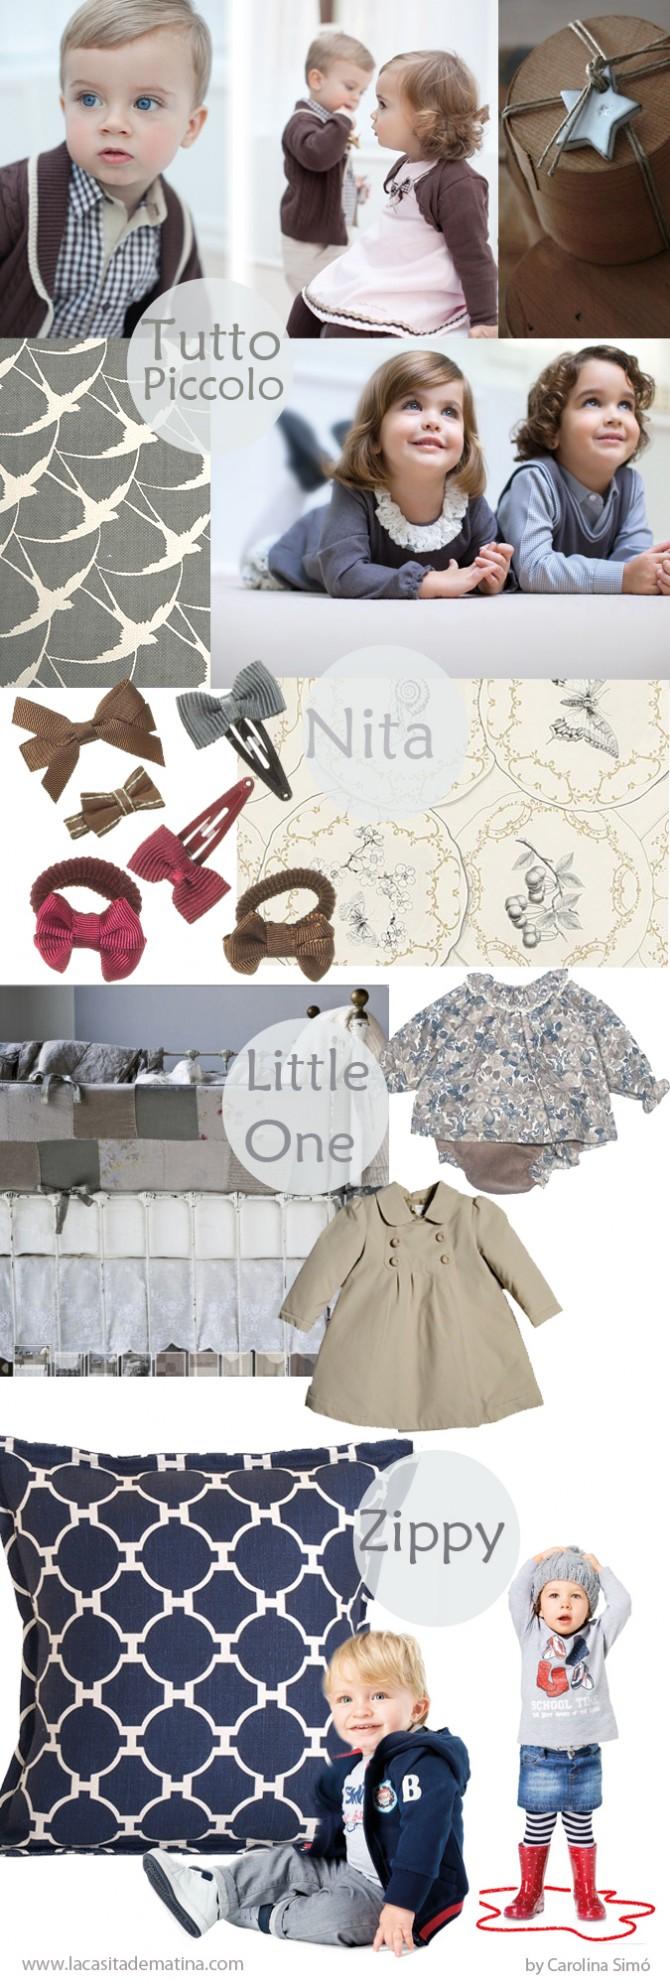 Tutto Piccolo, Zippy, Nita, Little One, La casita de Martina Blog de Moda Infantil y Moda Premamá